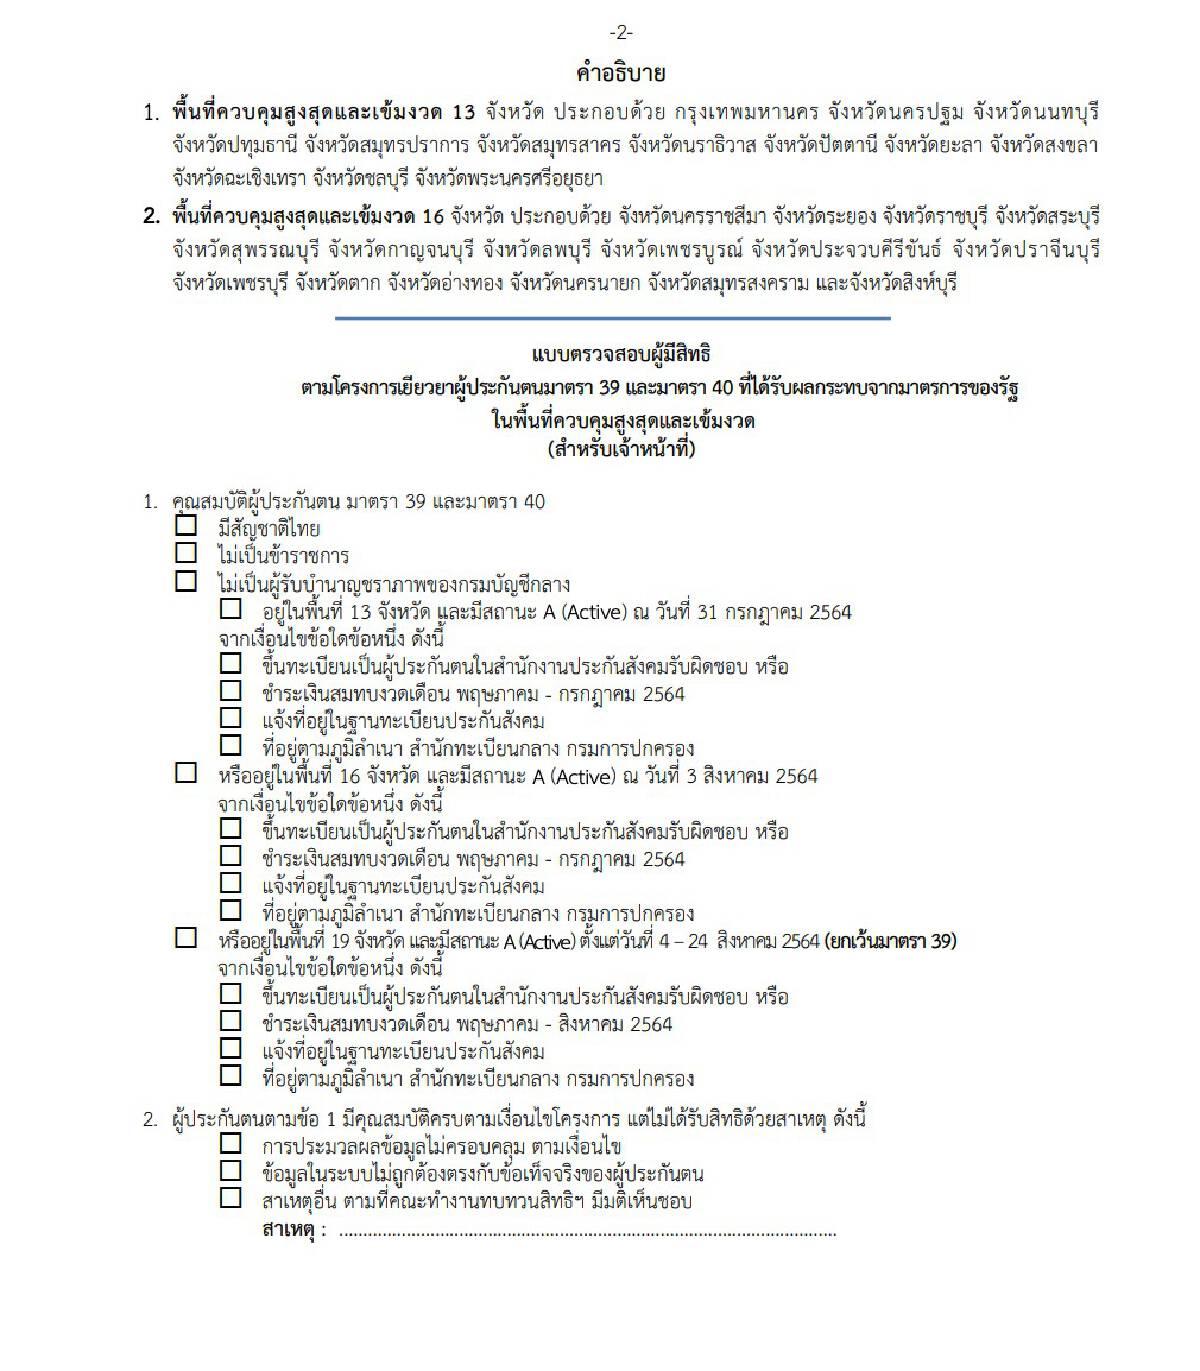 www.sso.go.th แบบฟอร์มทบทวนสิทธิ ม.33,ม.39 และ ม.40 เช็คที่นี่ครบทุกมาตรา